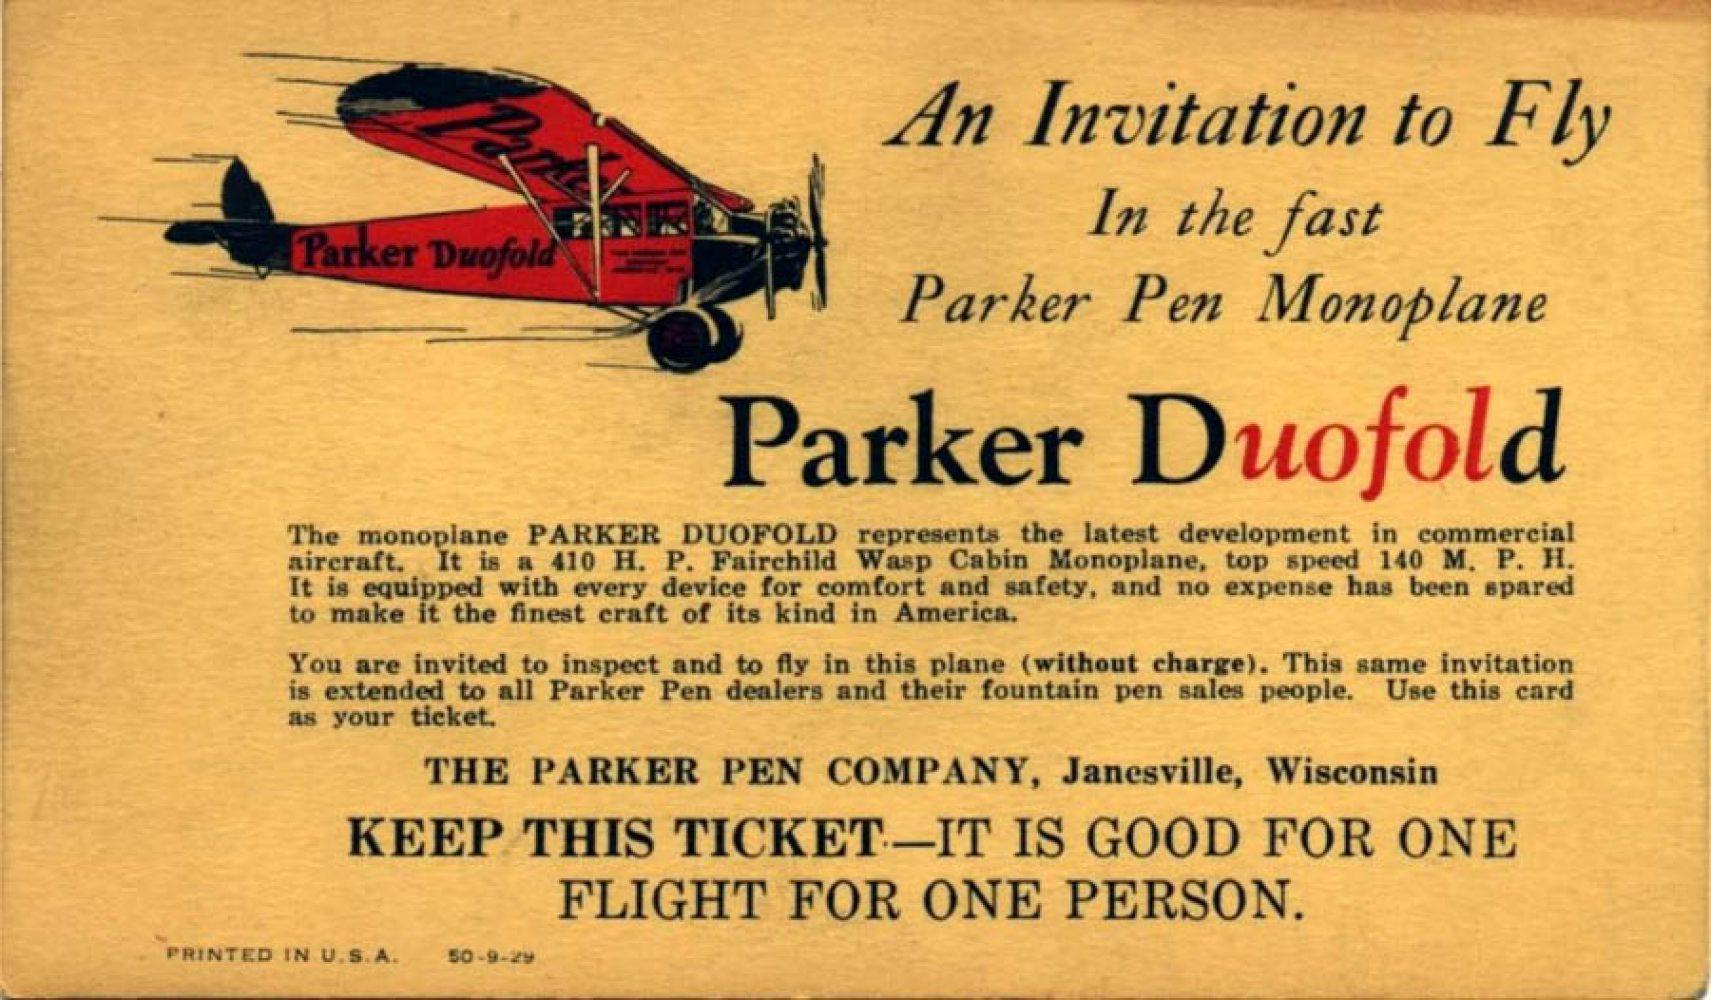 1929 09 00 Invitation Parker Duofold Monoplane